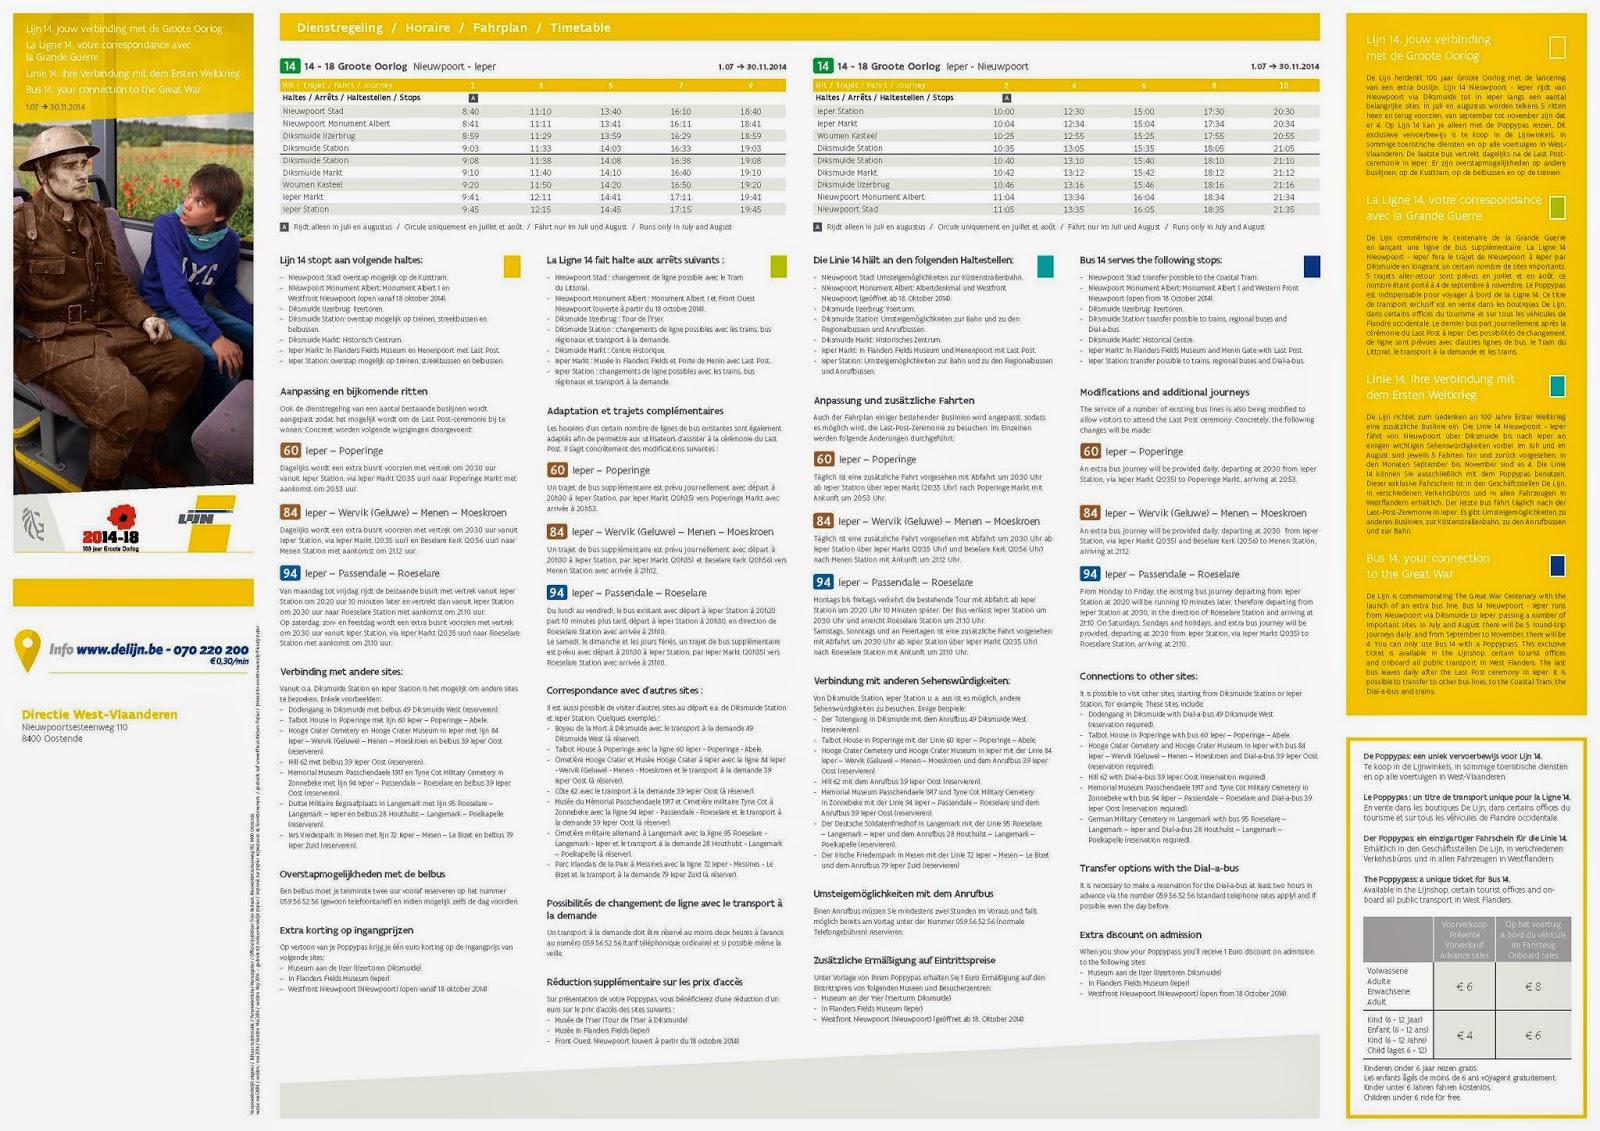 http://www.delijn.be/images/Lijn%2014_folder_LR%20voor%20web%20(2)_tcm7-41573.pdf